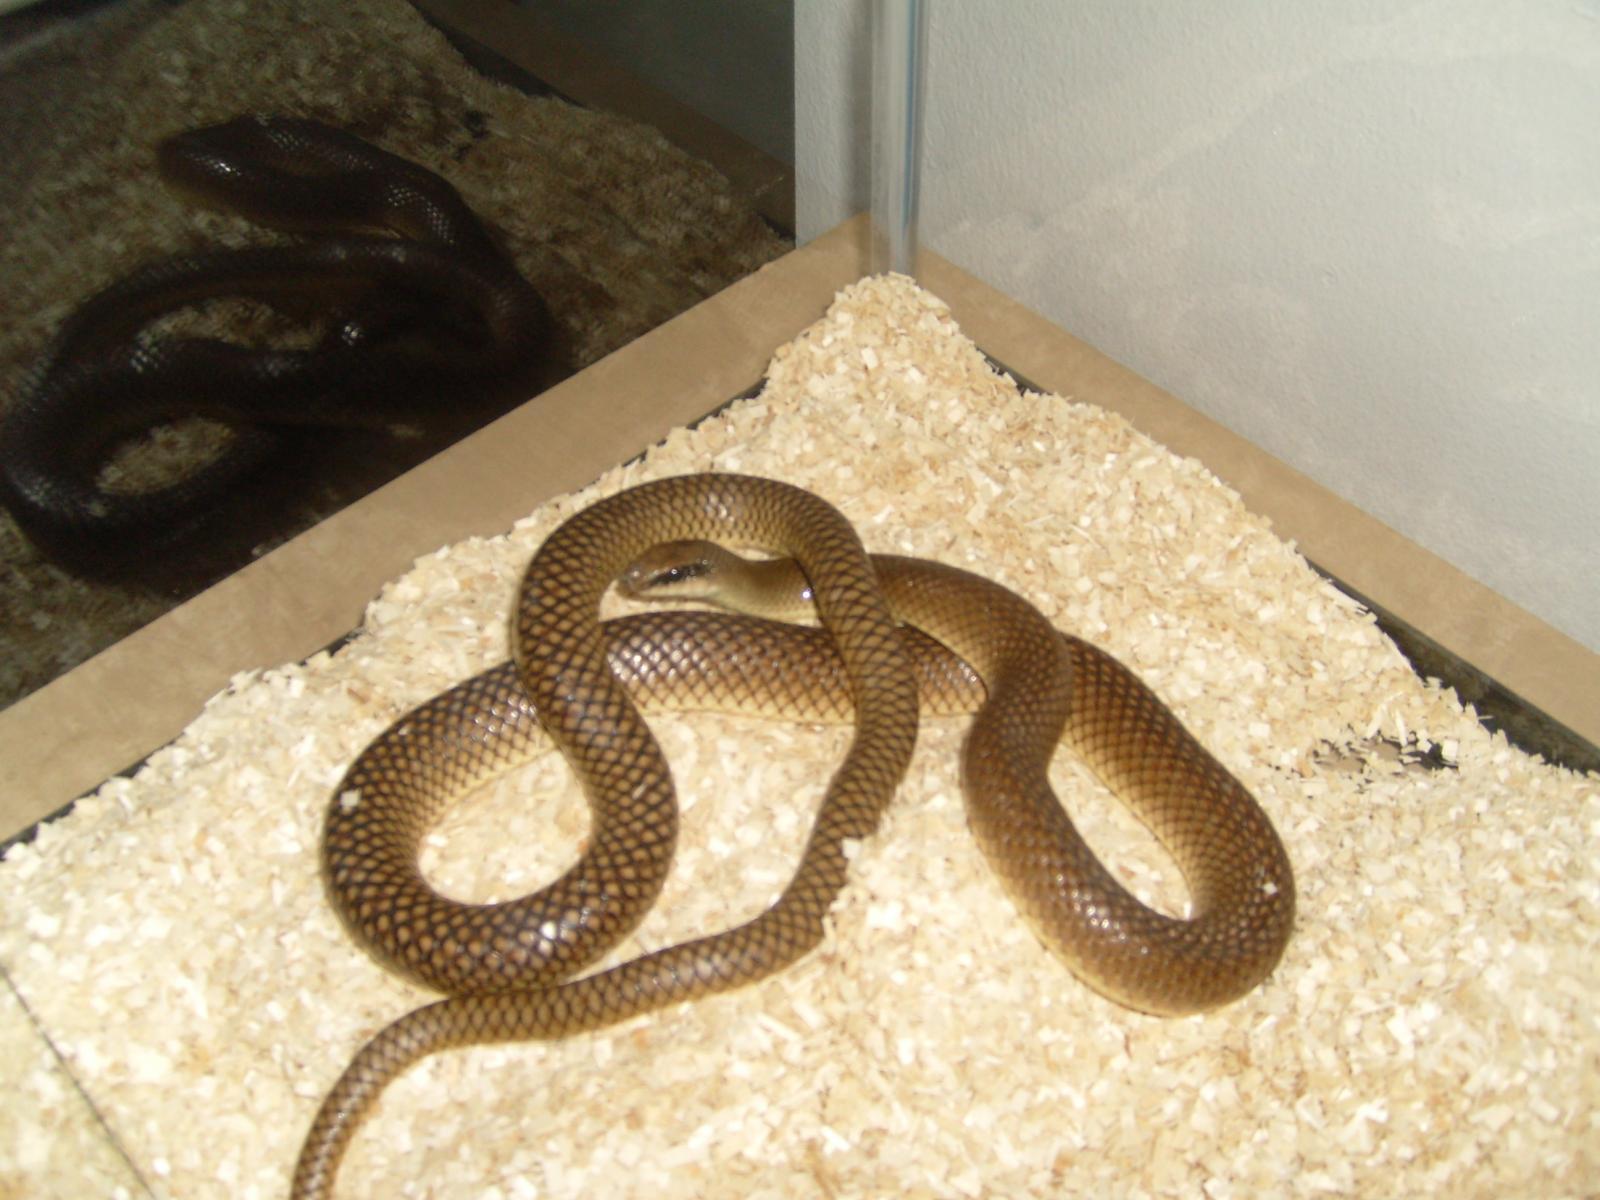 snake - photo #24